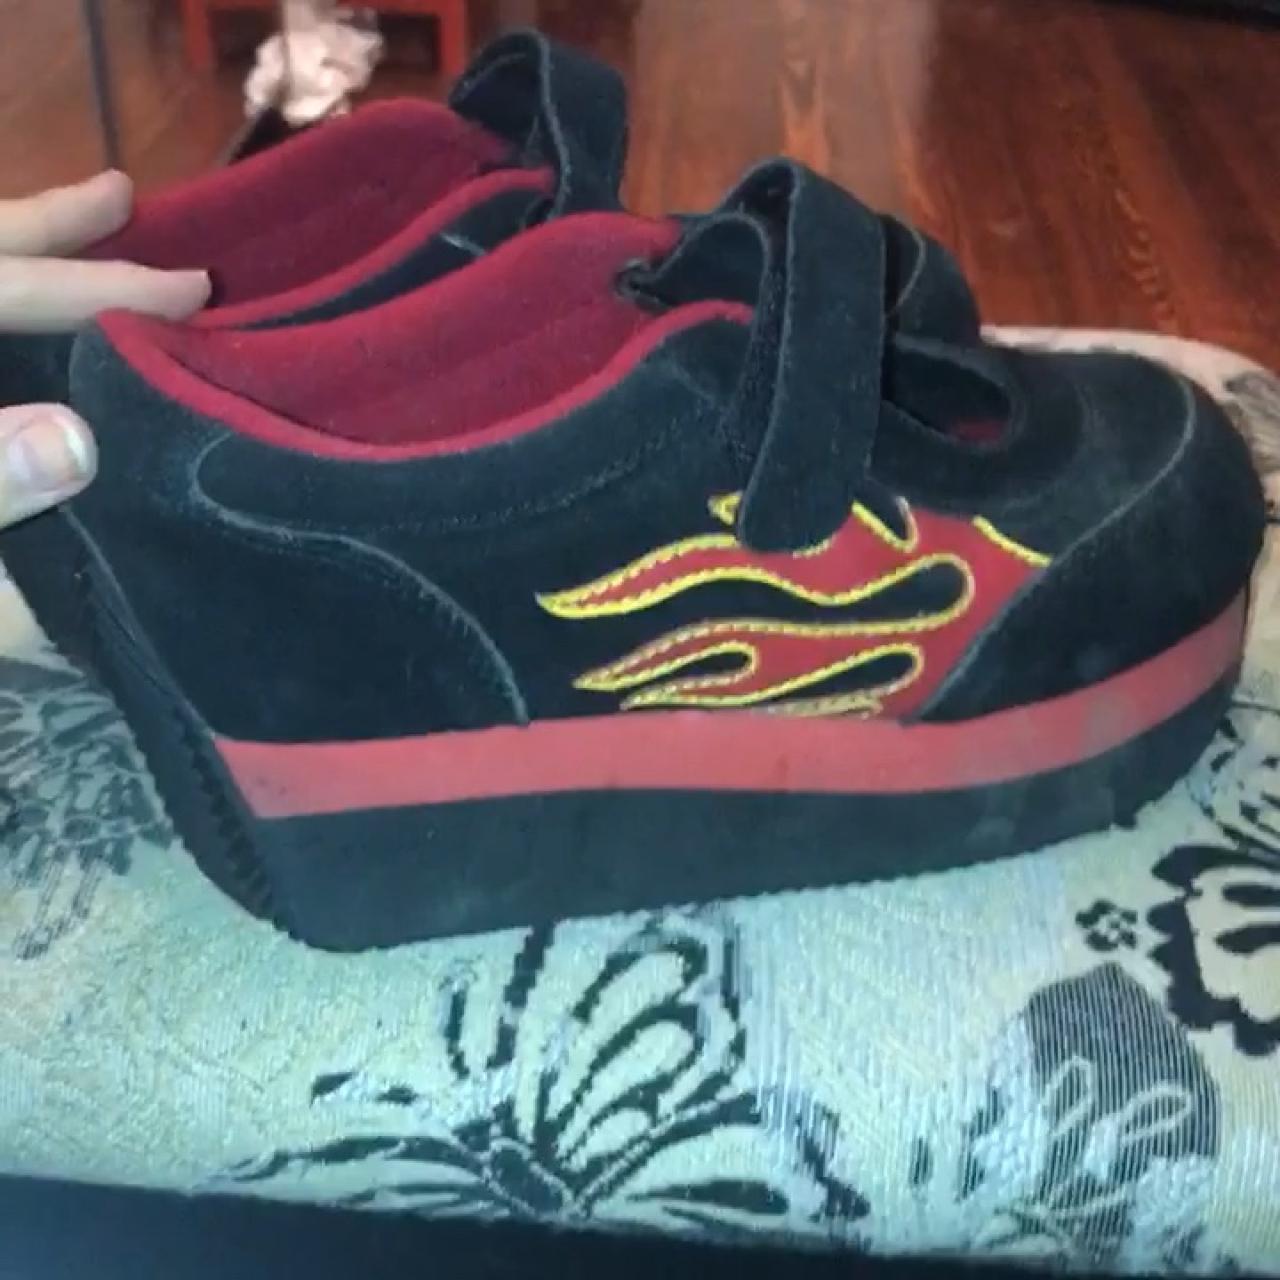 82bec17c663 Hella these volatile platform maryjane sneakers have a depop jpg 1280x1280 Volatile  platform sneakers 90s